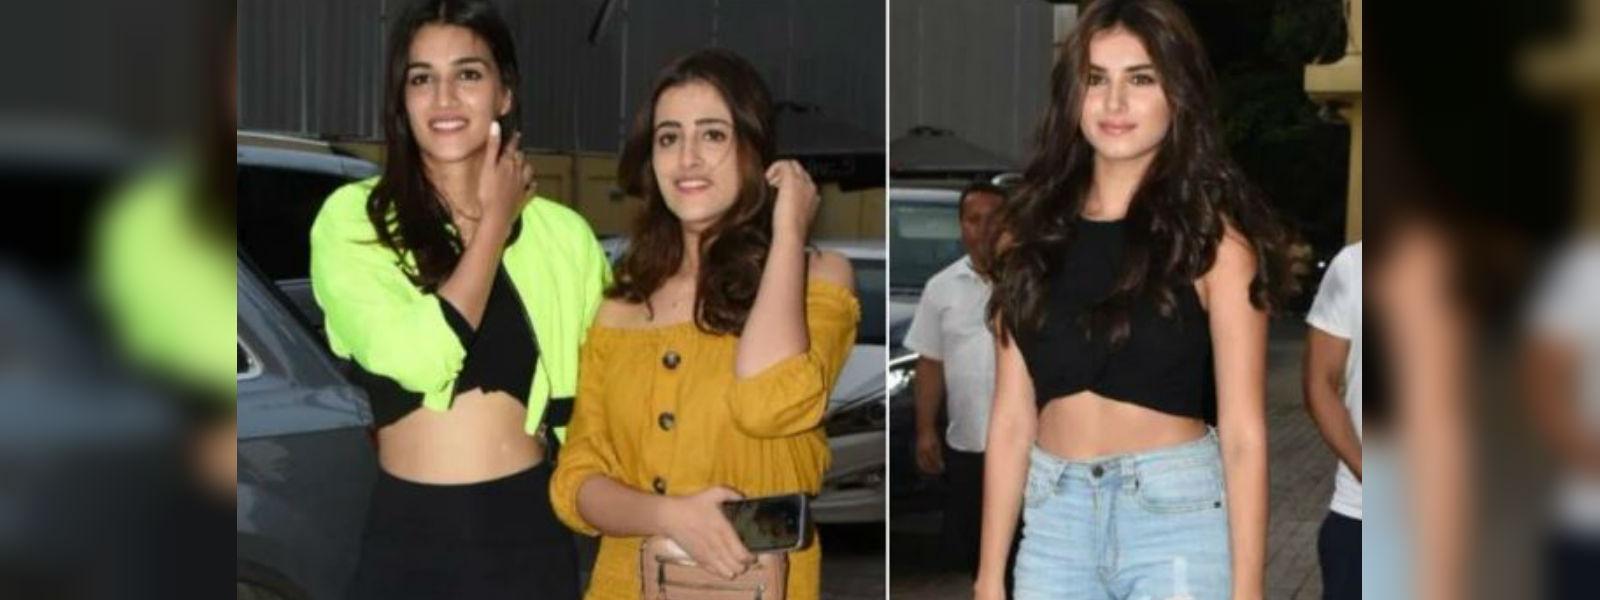 Bollywood stars attend screening of 'Avengers: Endgame' in Mumbai